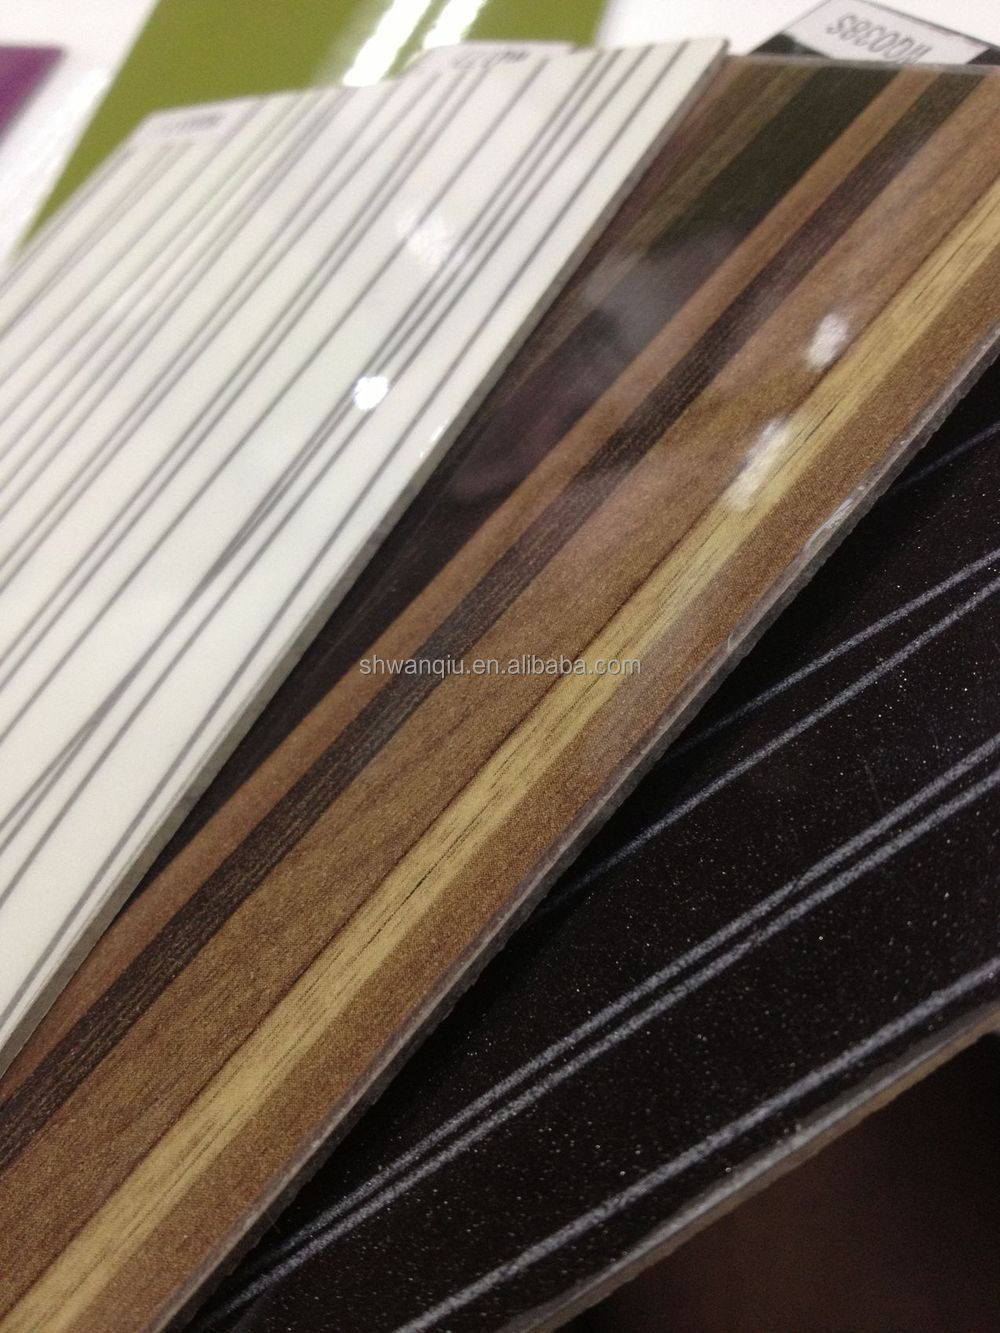 Uv Hpl For Exterior Wall Panel Cladding Buy Uv Hpl For Exterior Wall Panel Cladding Uv Hpl Hpl